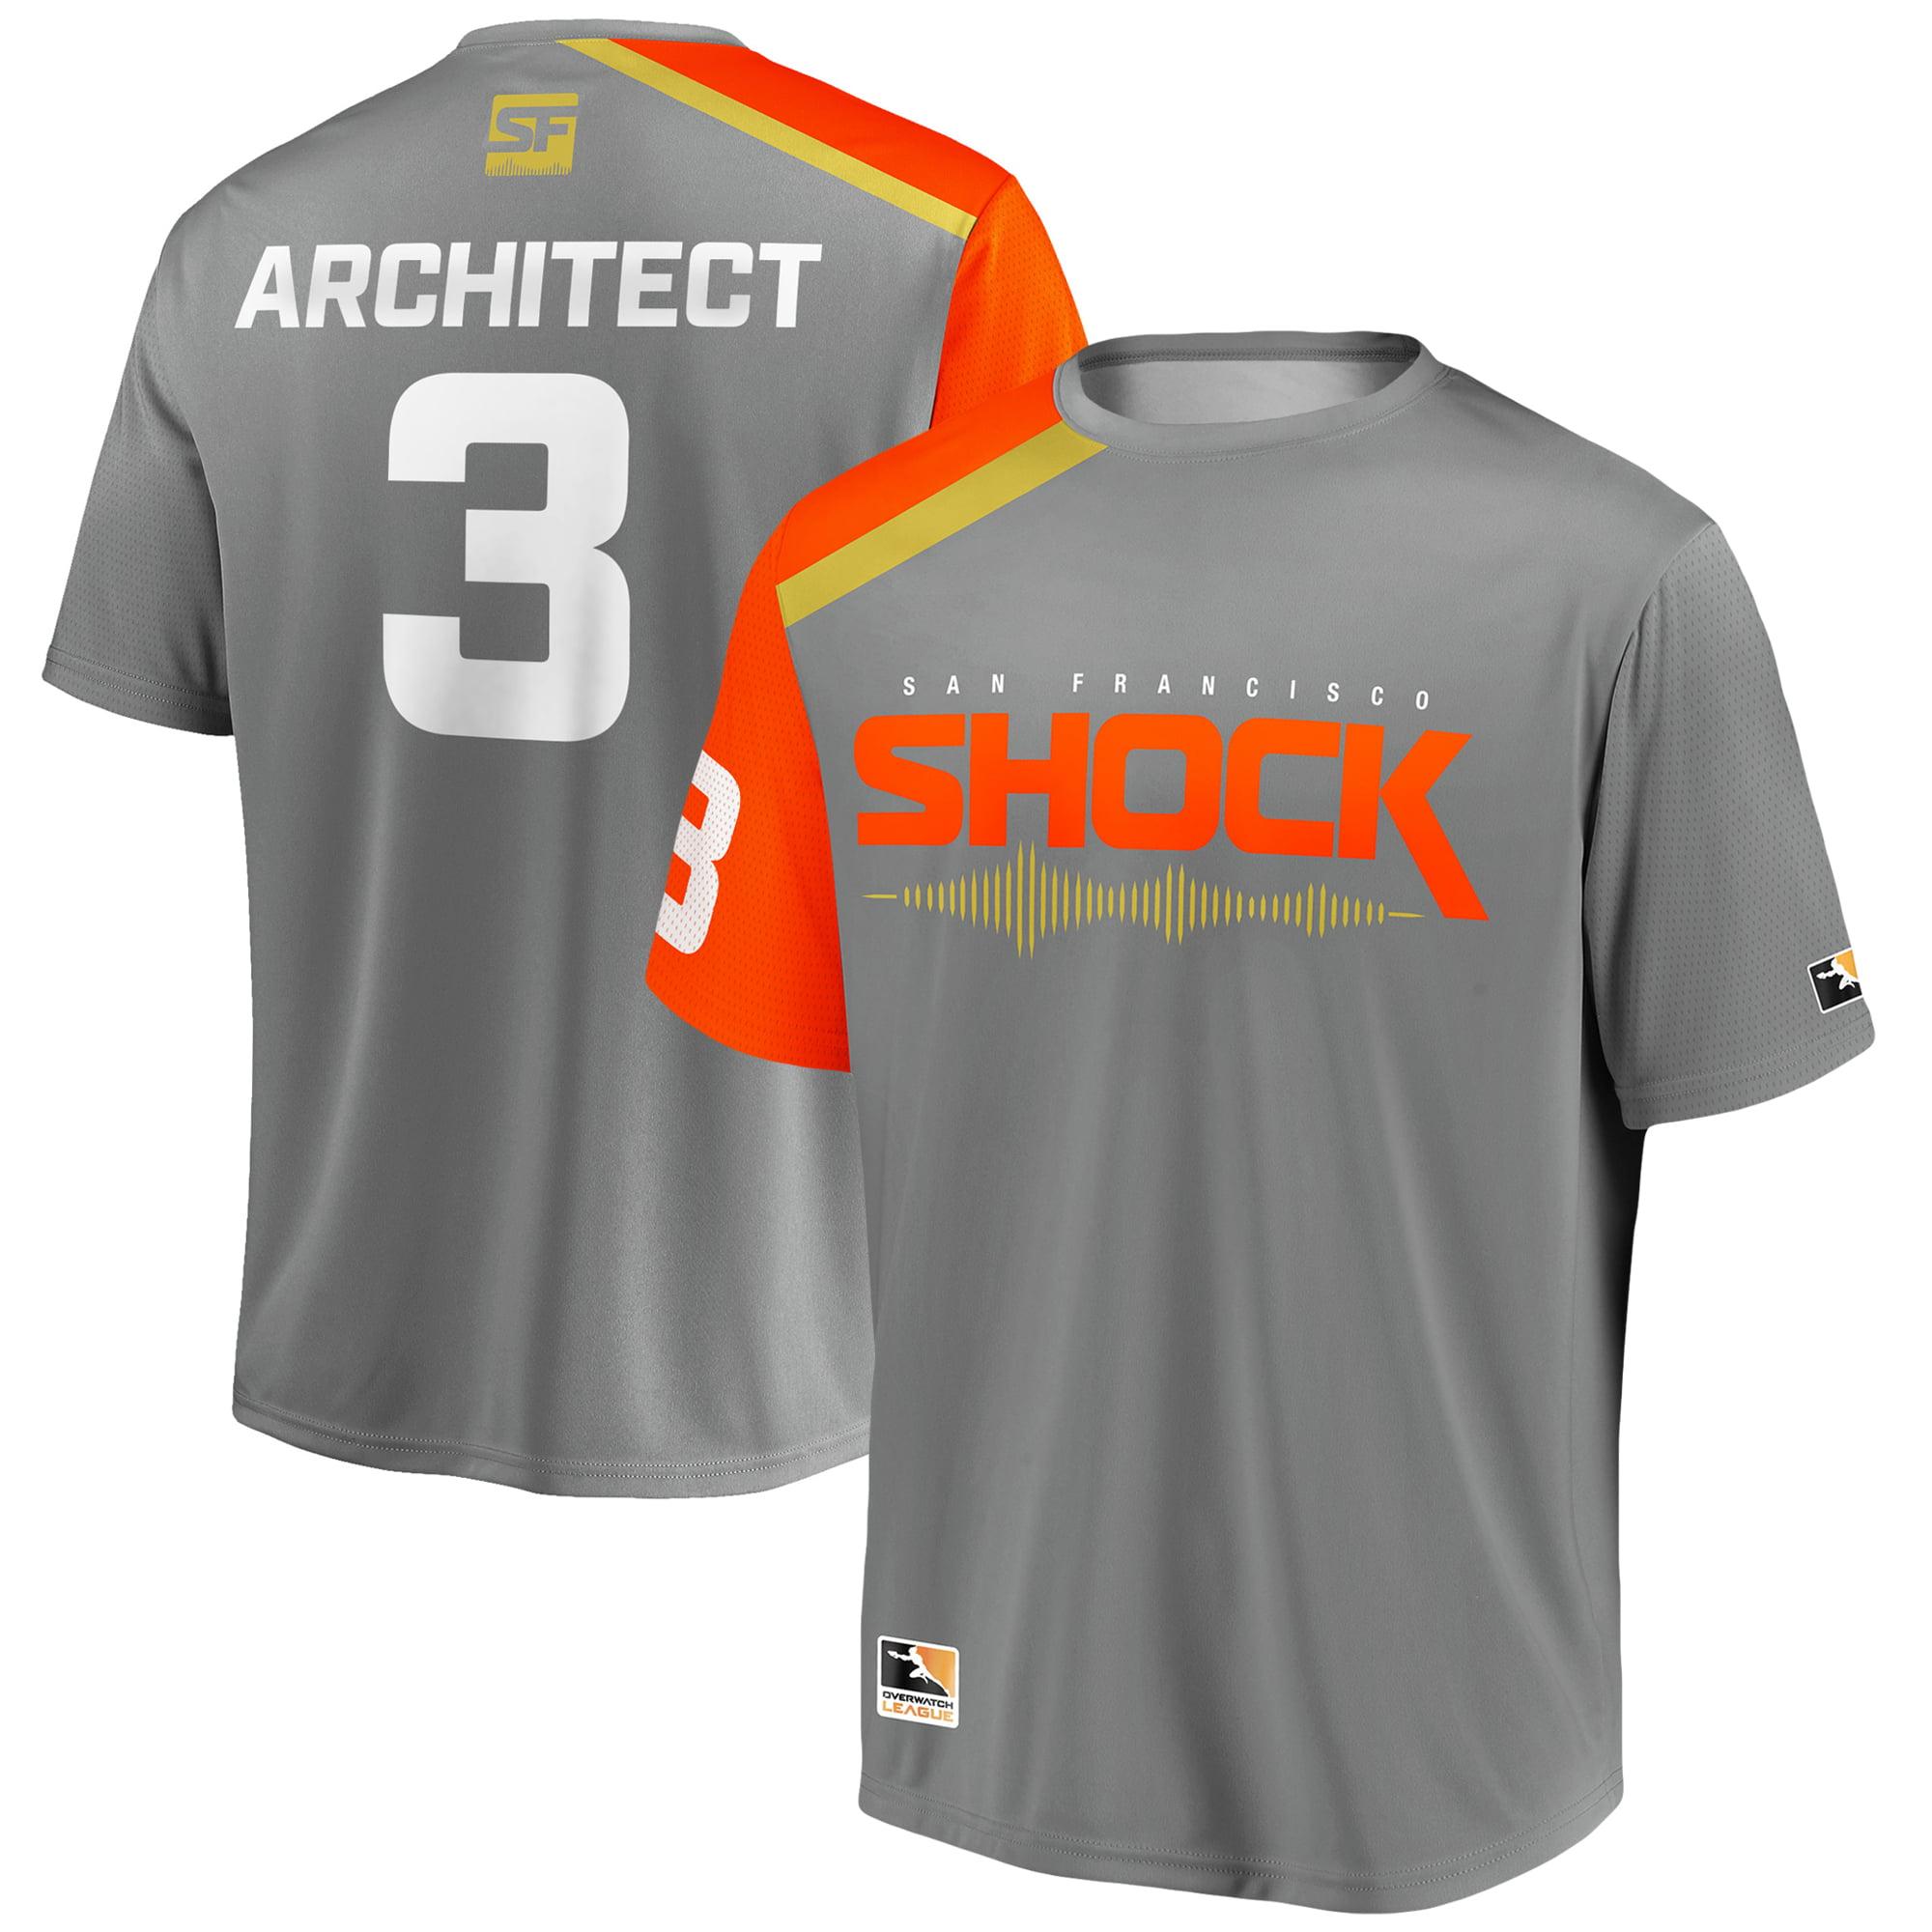 Architect San Francisco Shock Overwatch League Replica Home Jersey - Gray